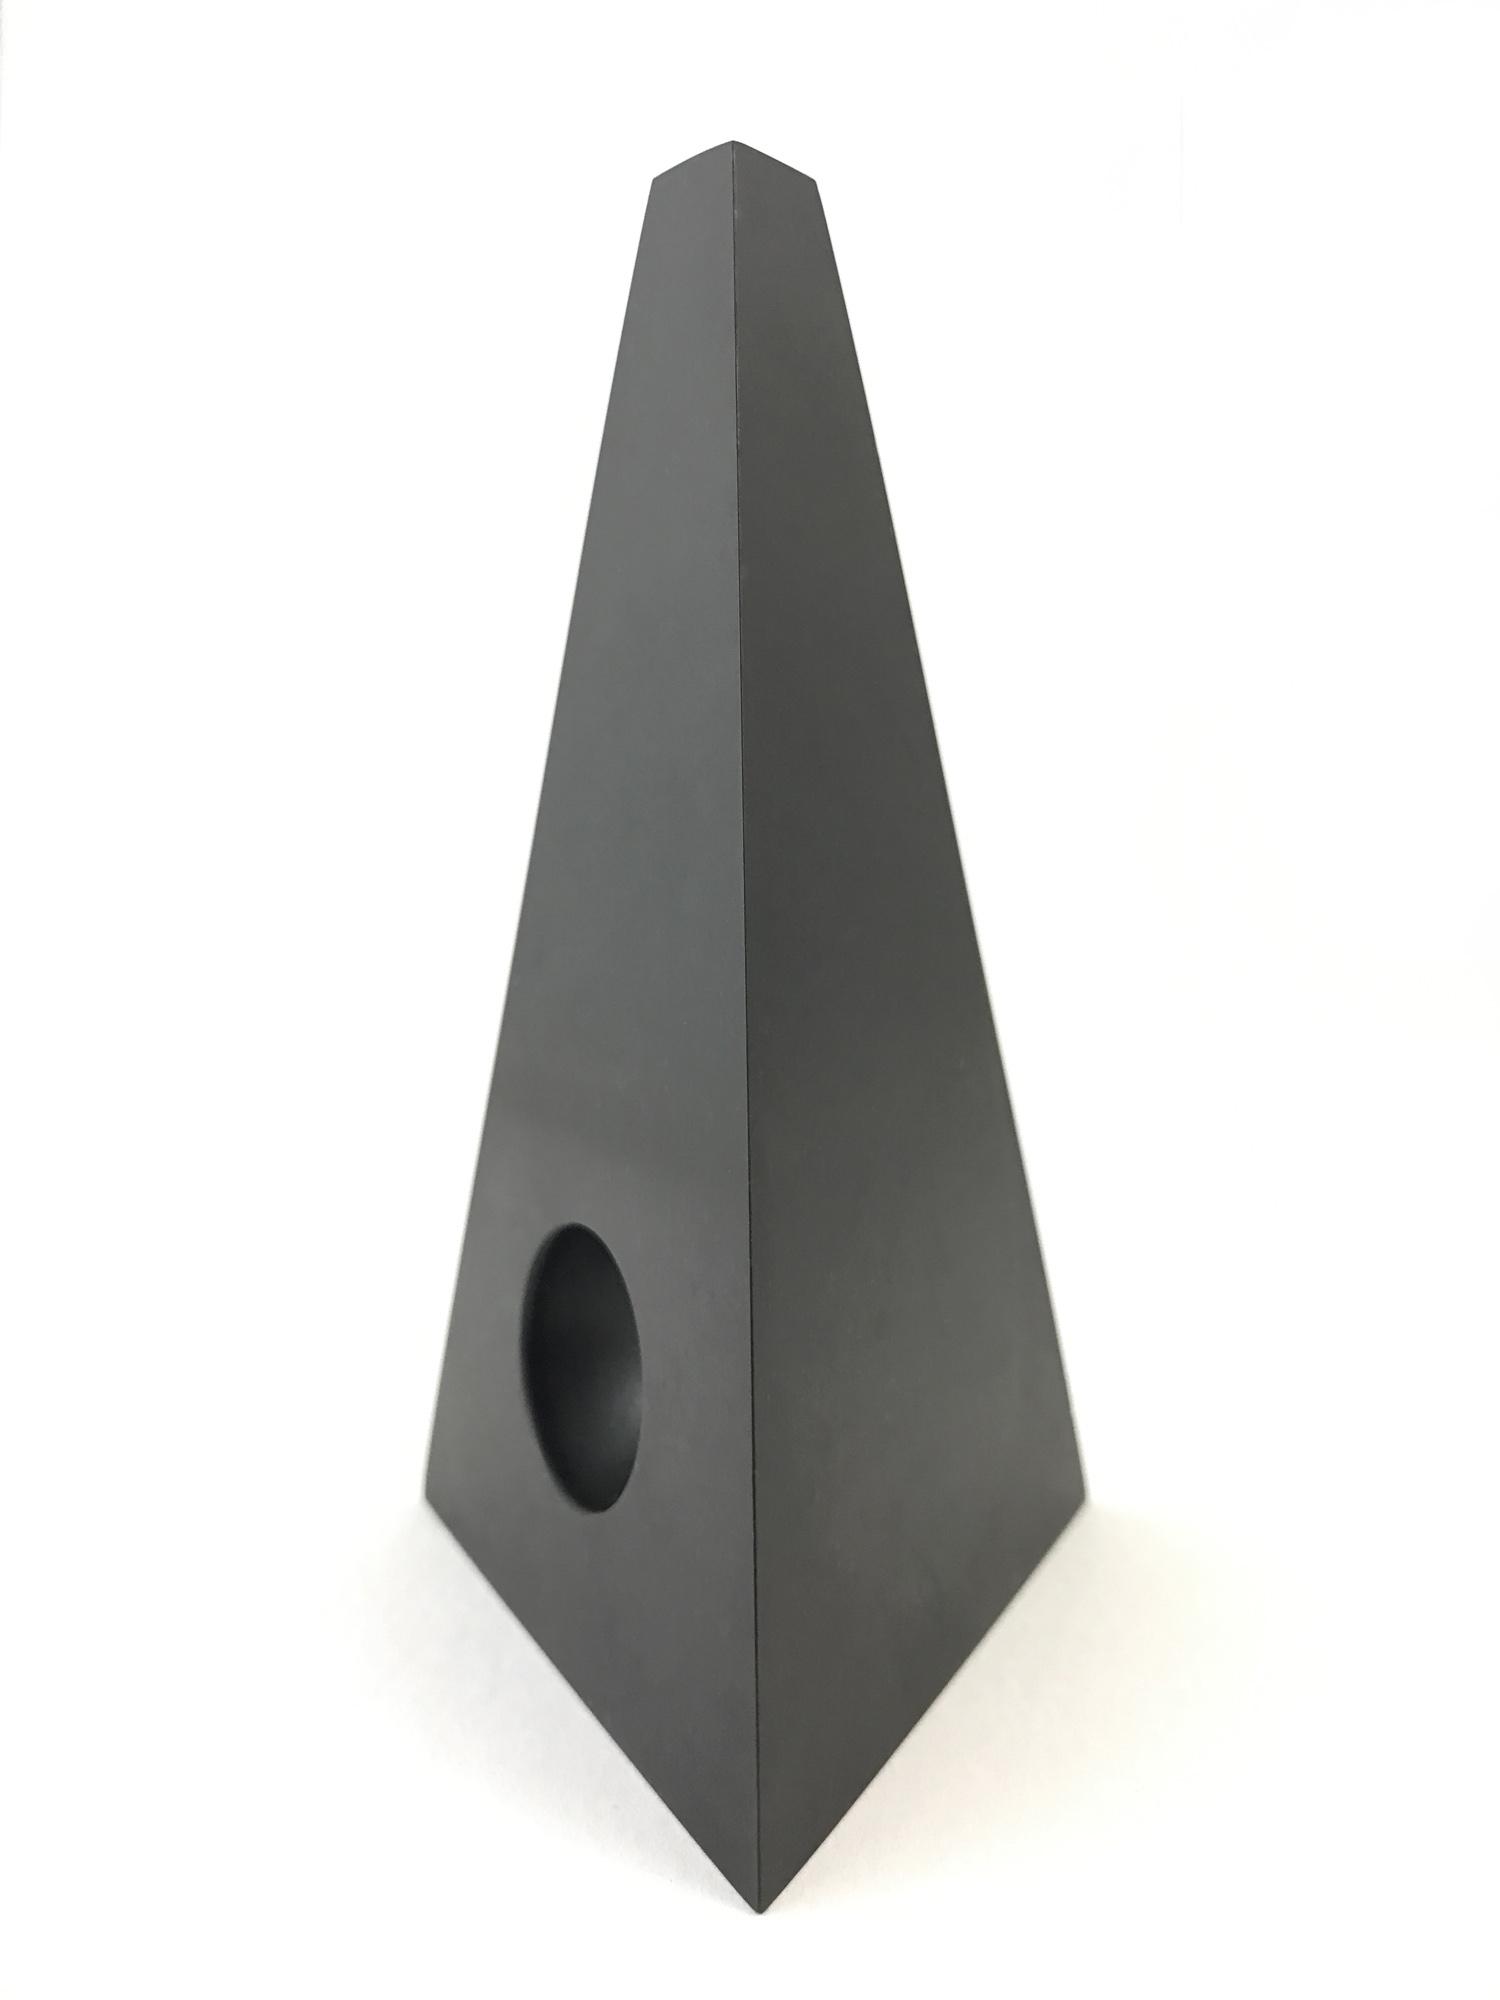 monolithic-pipe.jpg